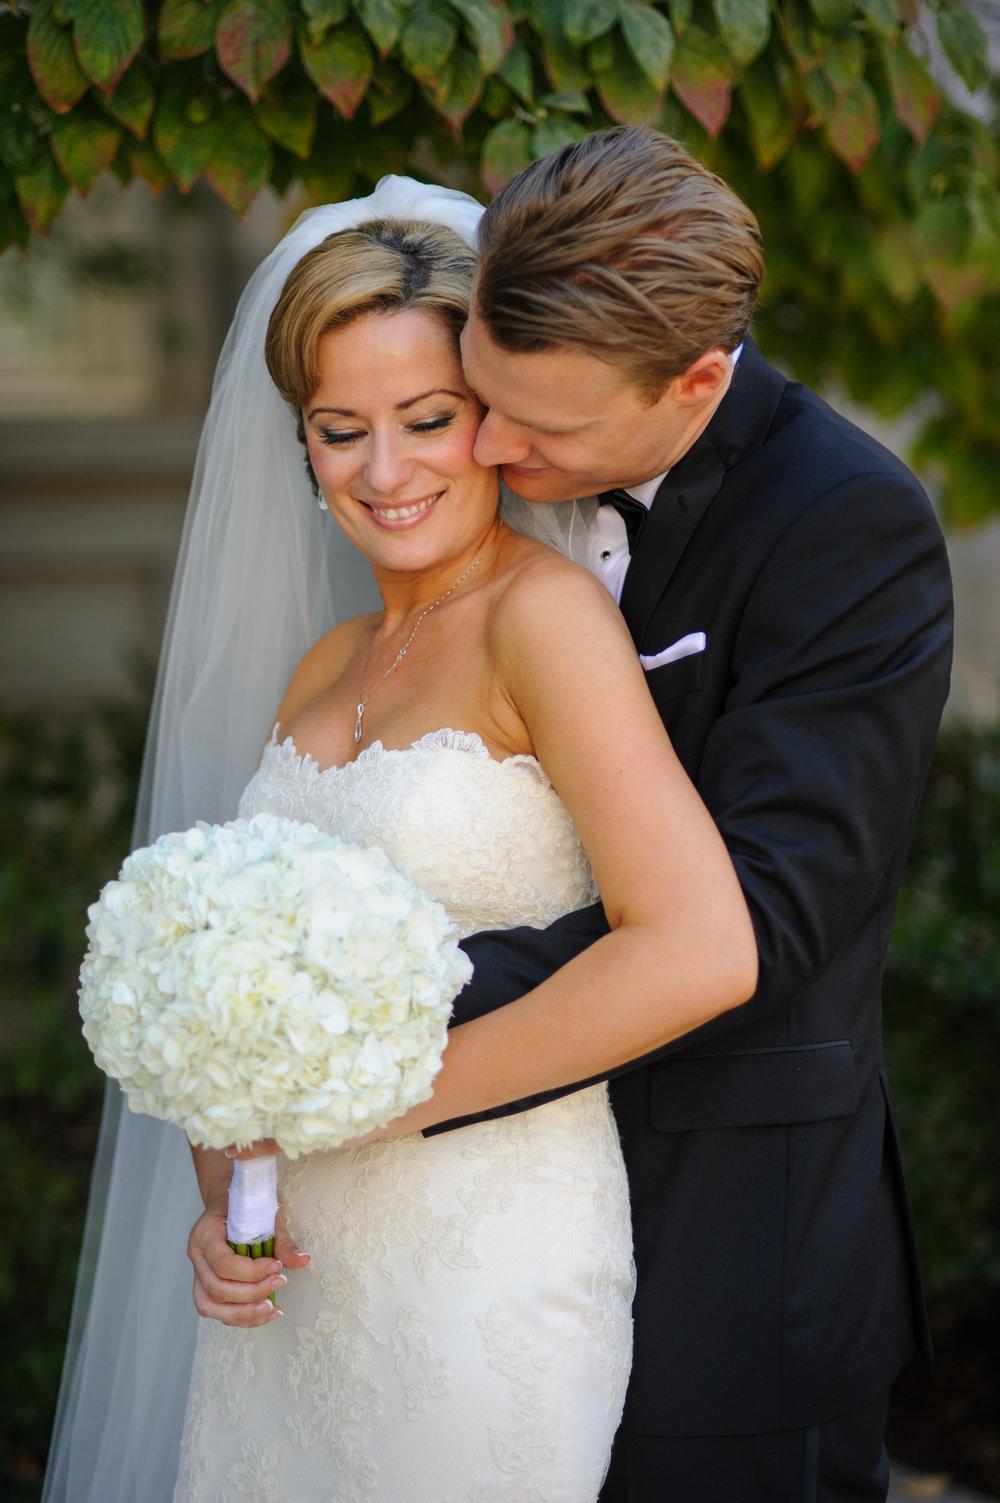 jenn-dave-025-arden-hills-sacramento-wedding-photographer-katherine-nicole-photography.JPG